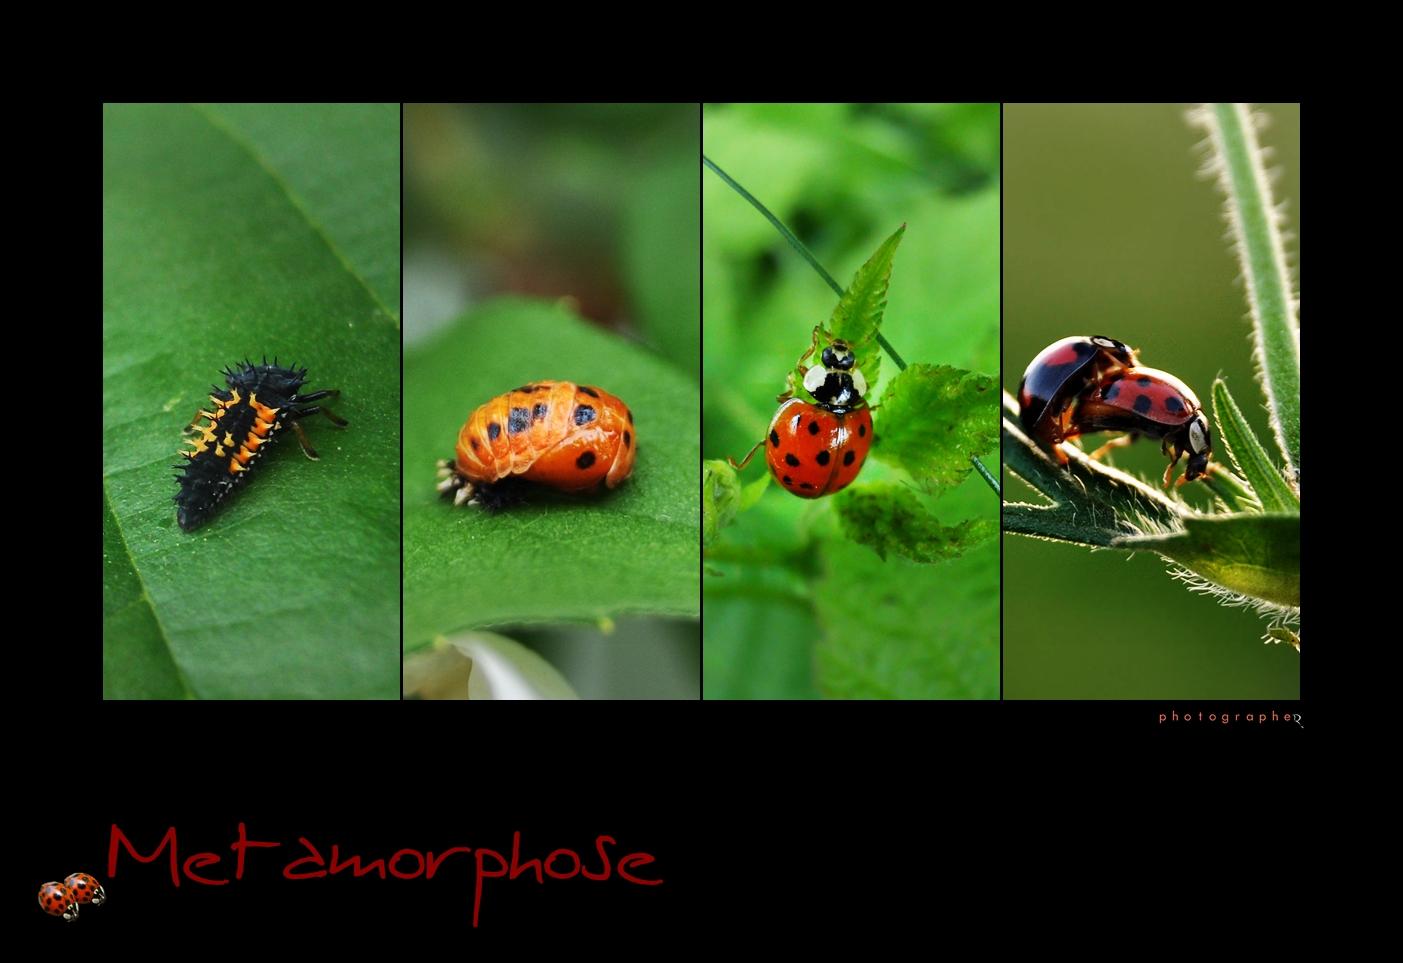 metamorphose foto bild tiere wildlife insekten bilder auf fotocommunity. Black Bedroom Furniture Sets. Home Design Ideas